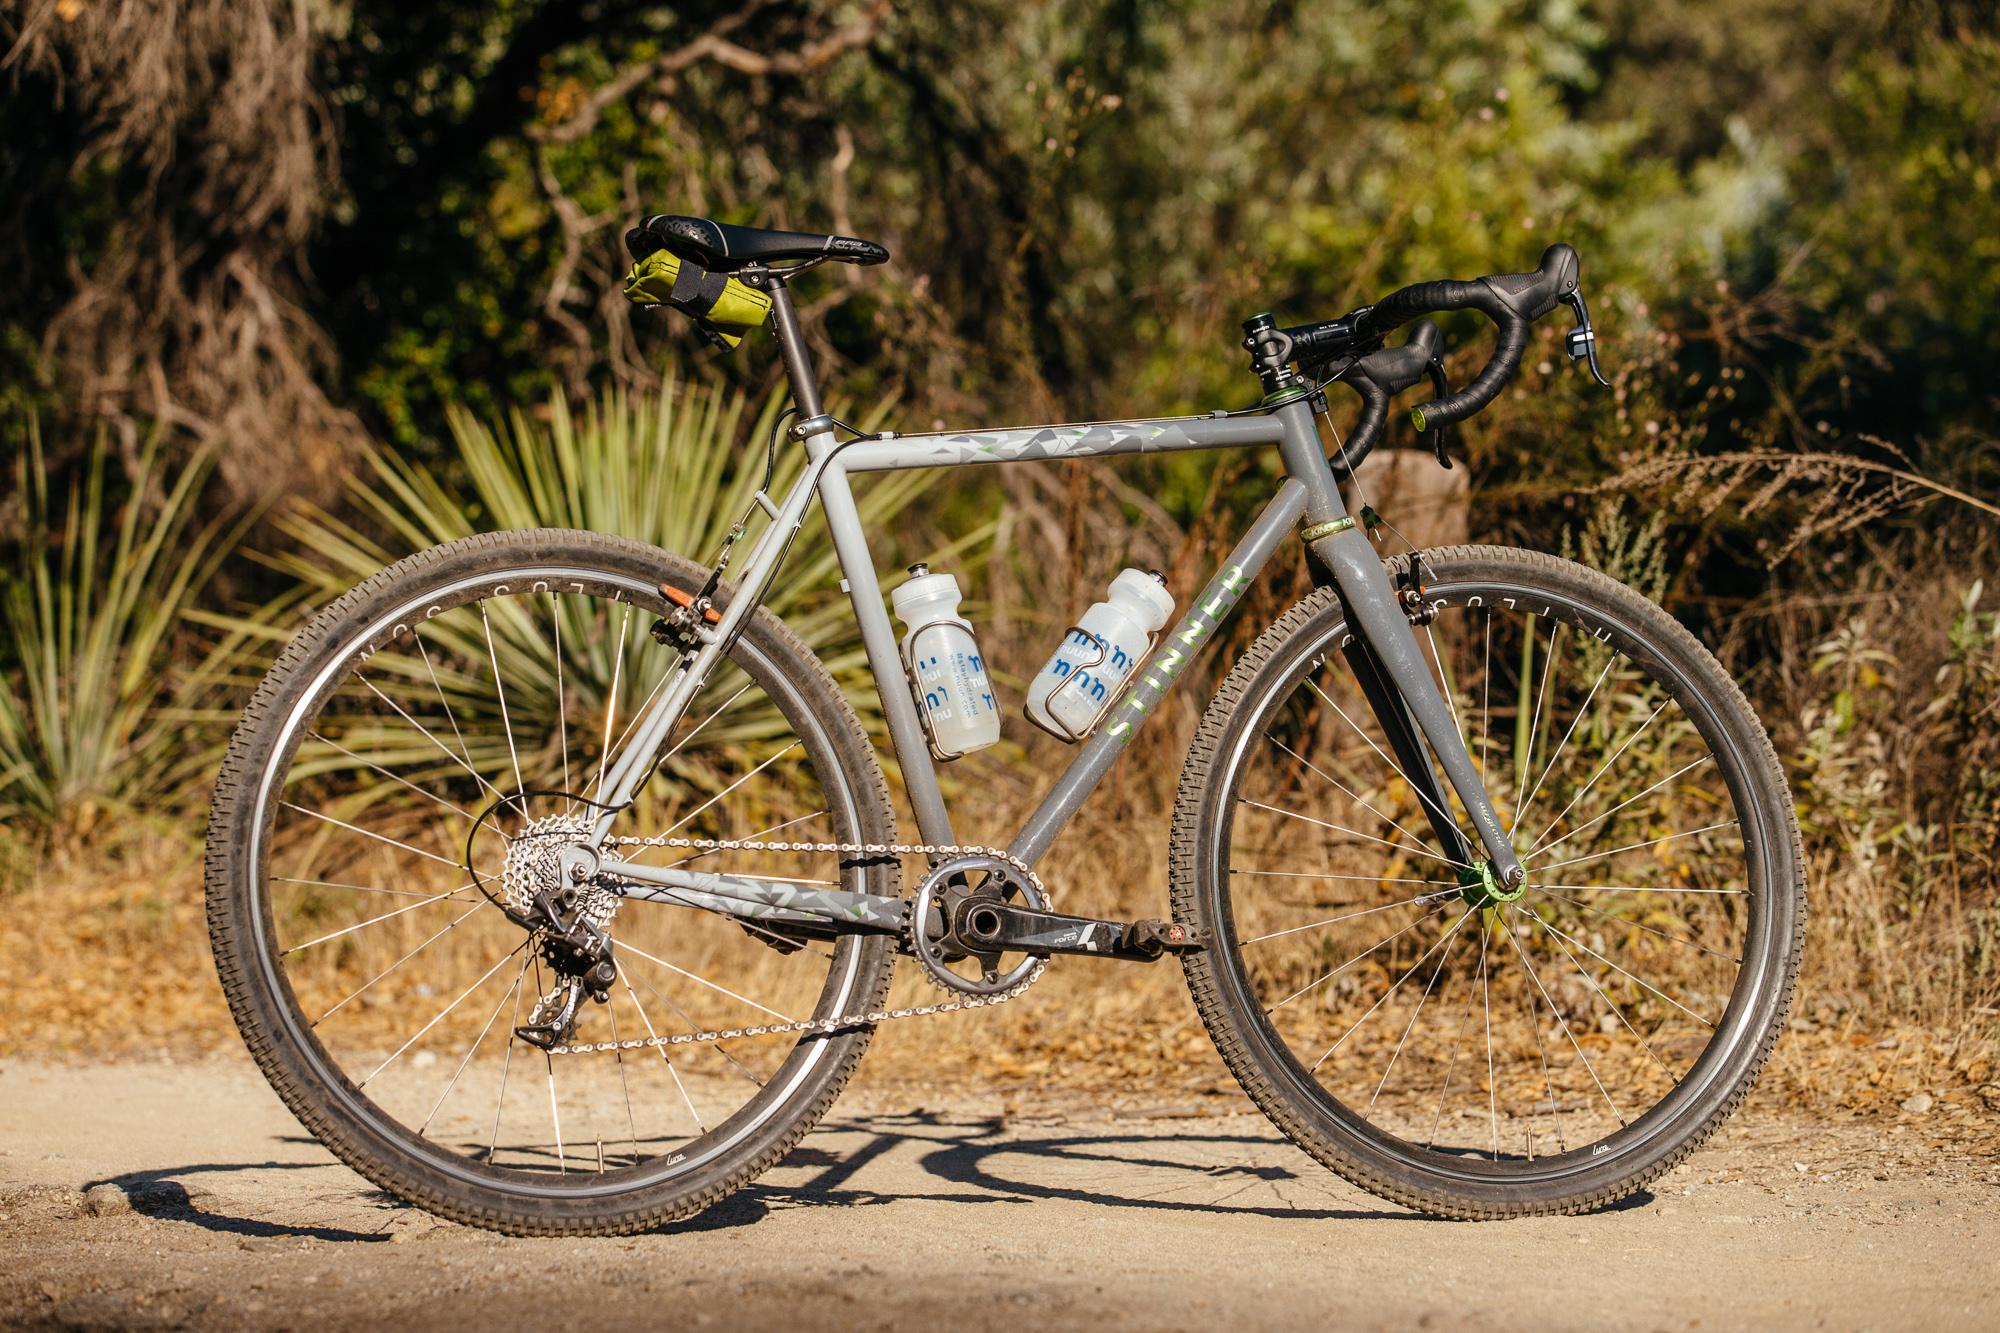 Kelli's Stinner 'Cross Bike with Airglow Paint